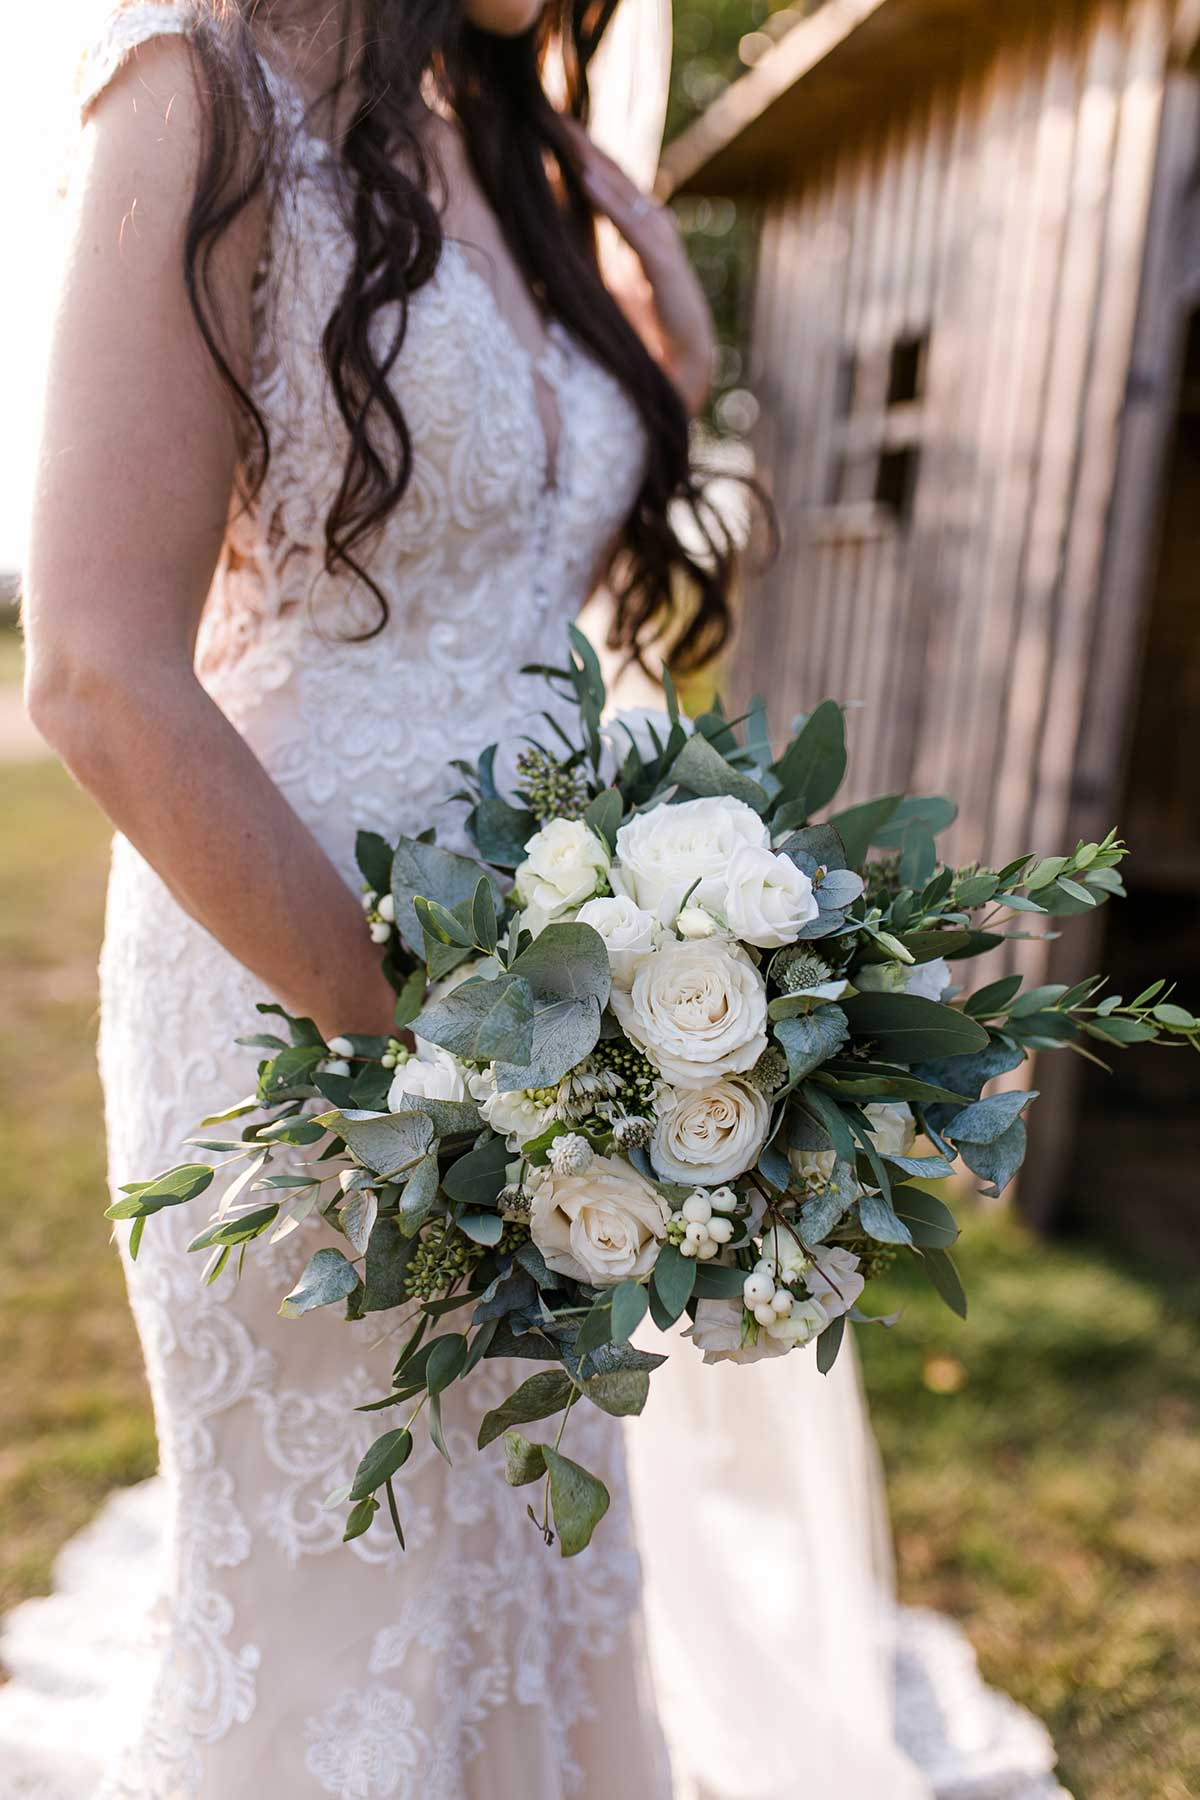 Brautstrauß im Greenery Chic Stil